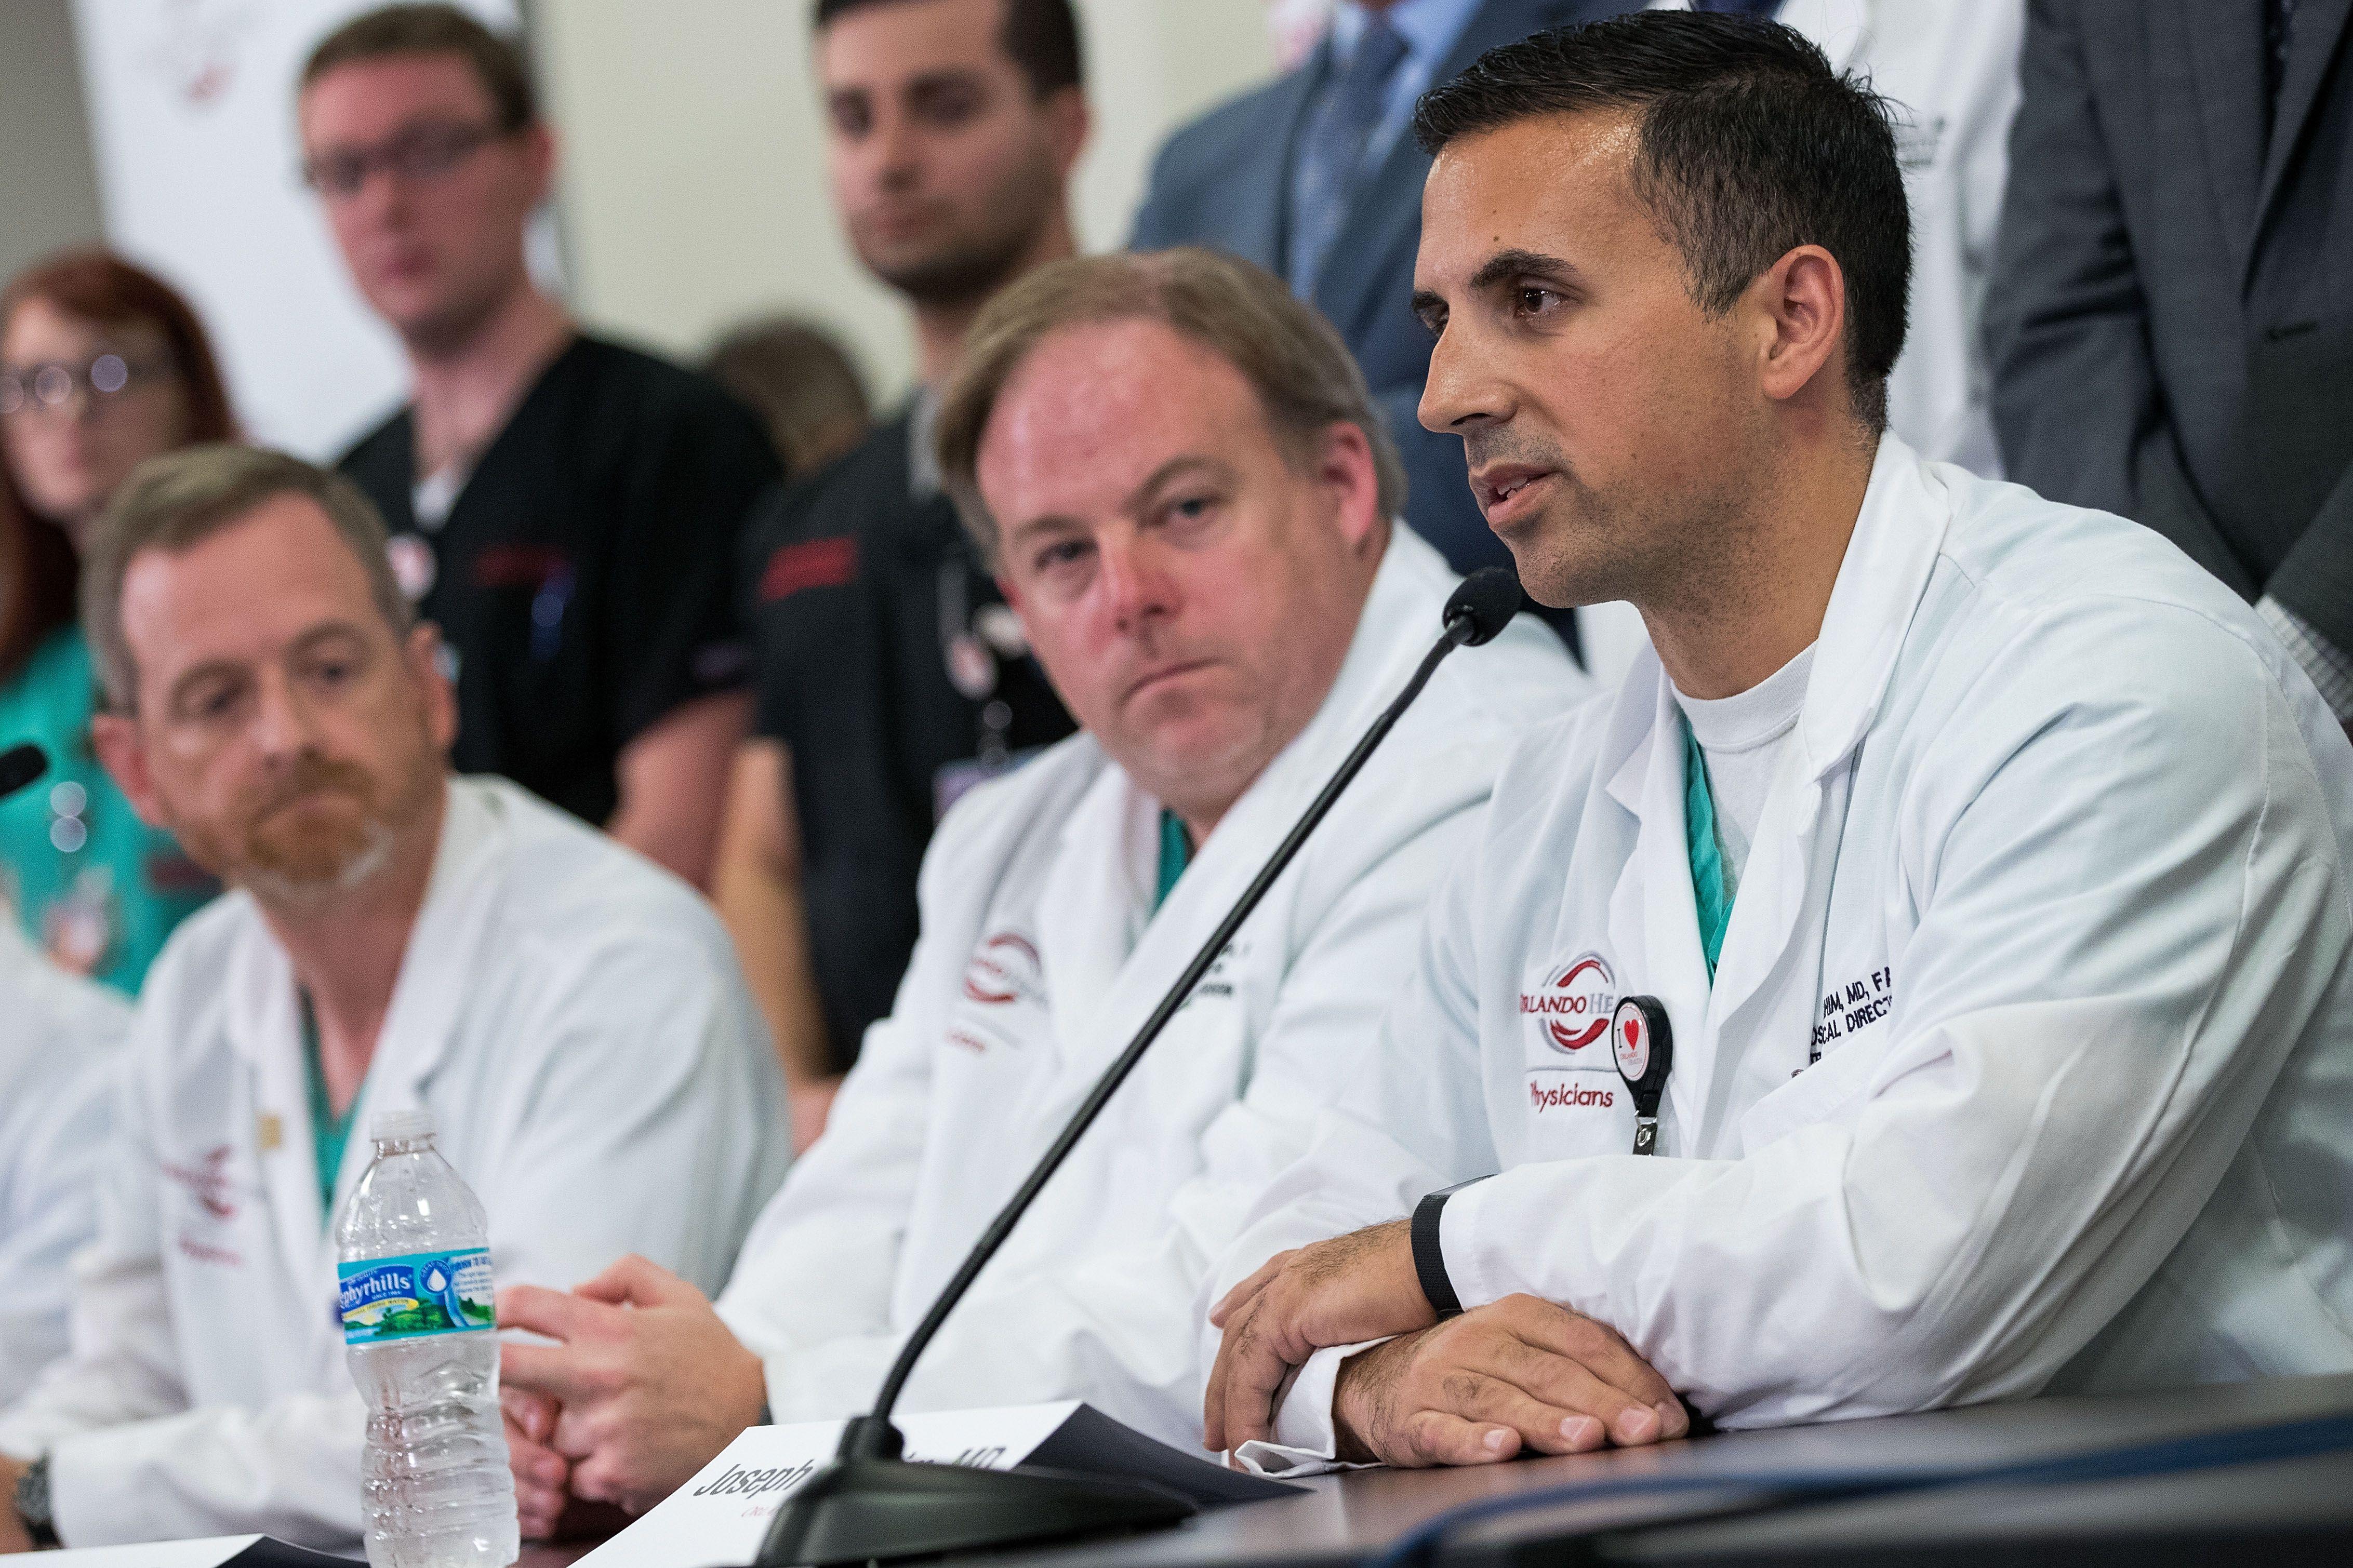 A Trauma Surgeon Recalls the Night of the Orlando Massacre